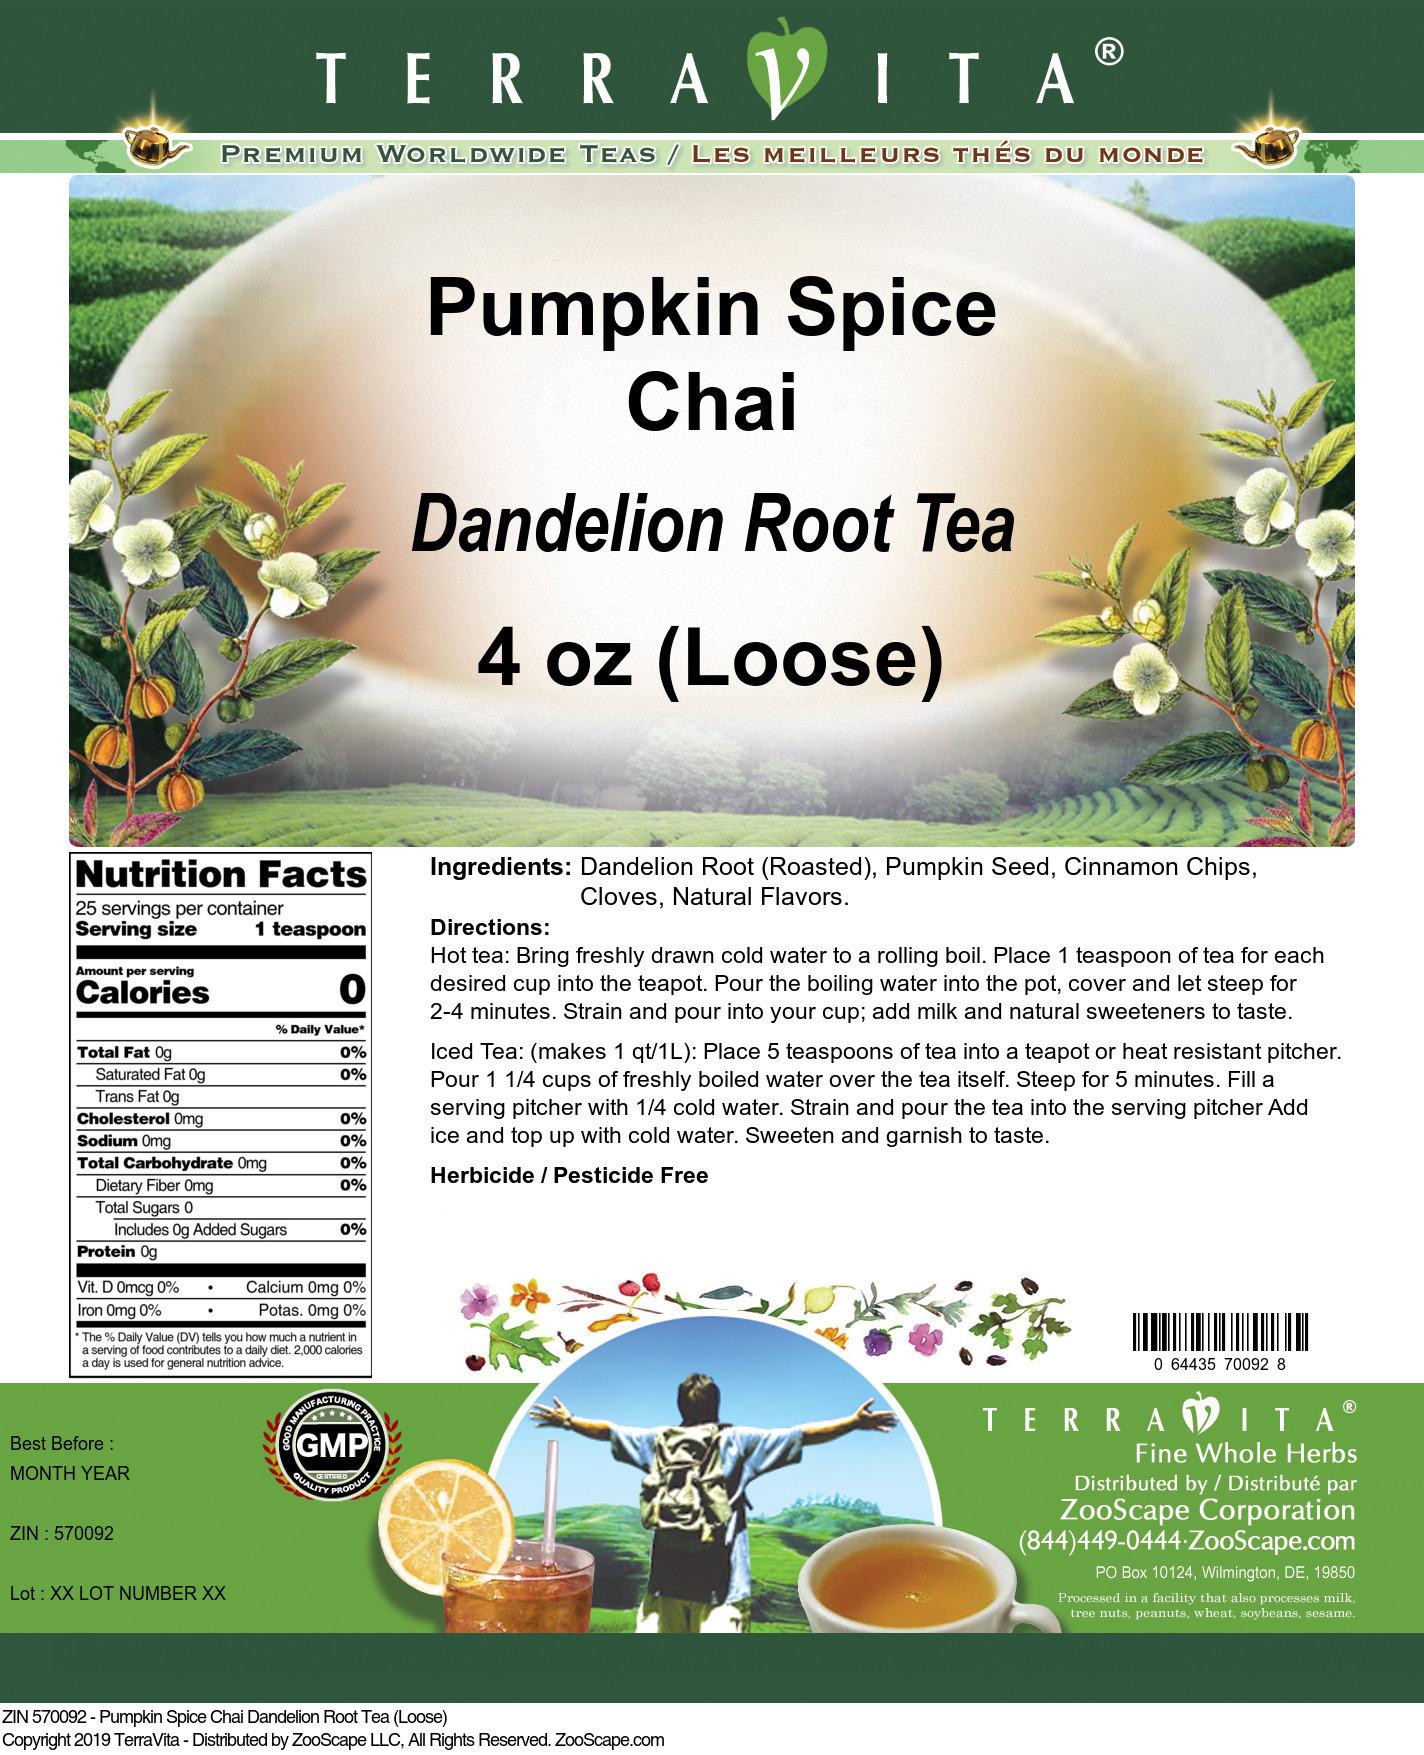 Pumpkin Spice Chai Dandelion Root Tea (Loose)